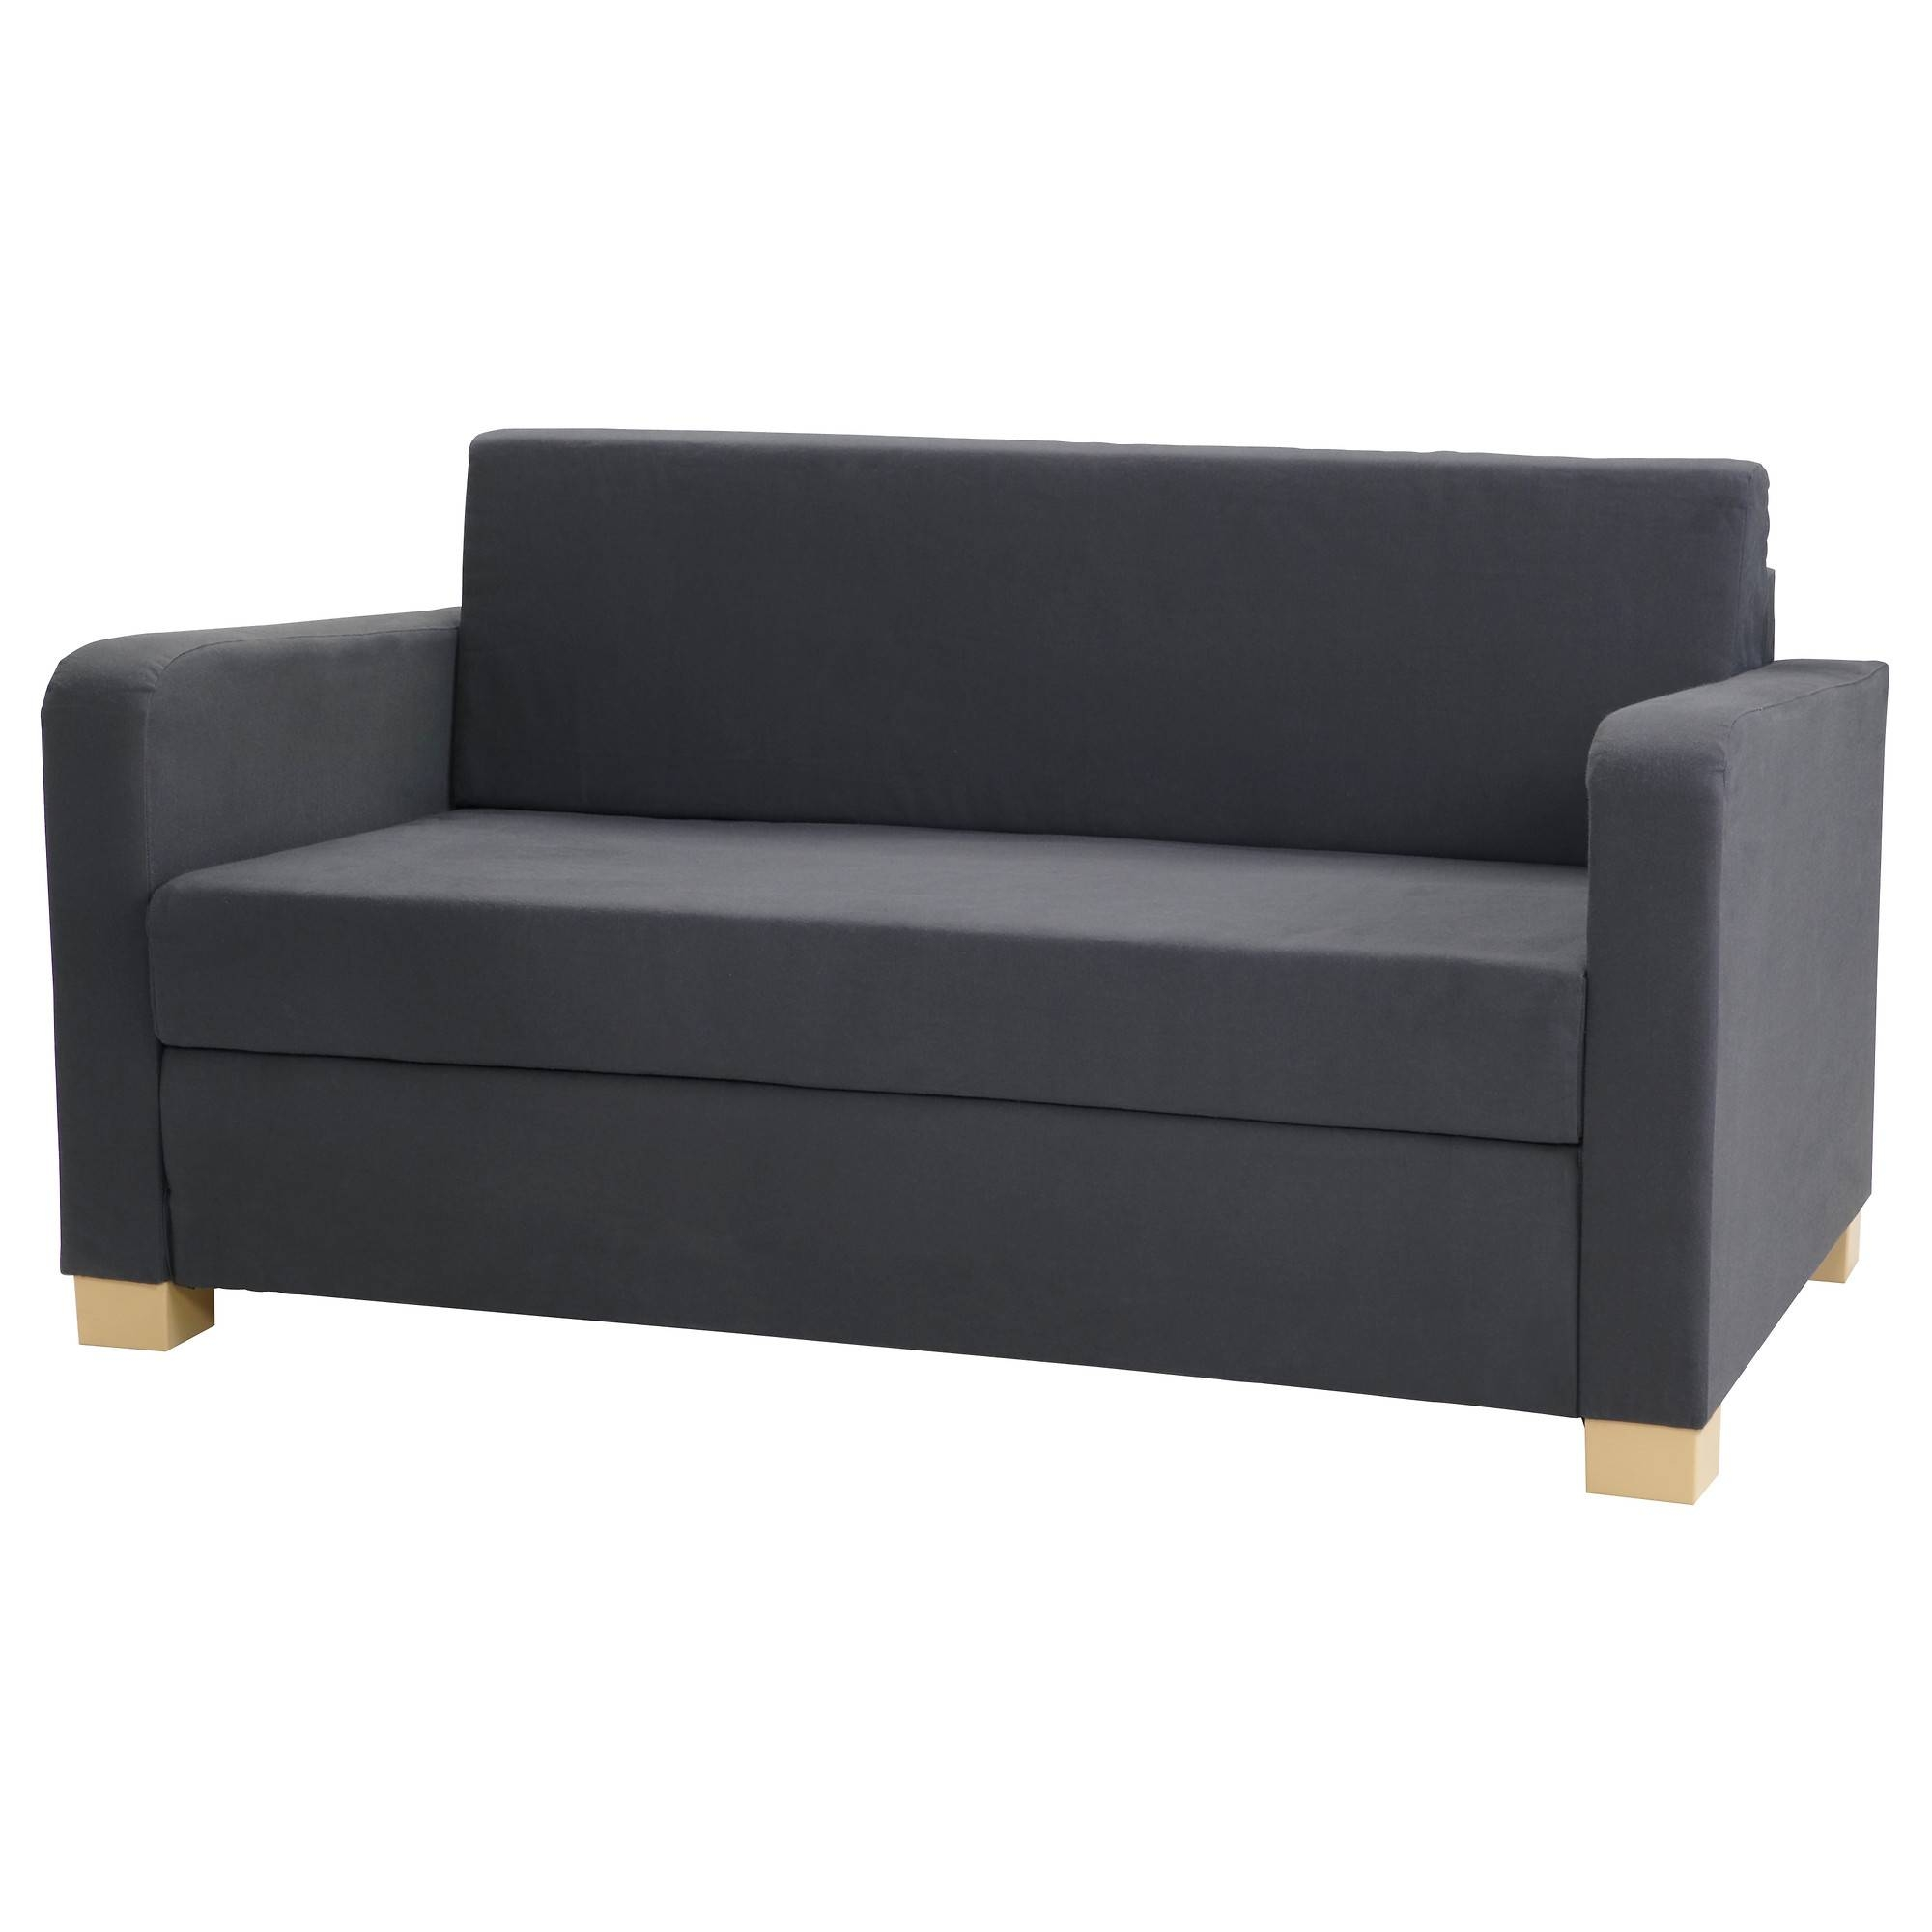 Sofa Beds & Futons - Ikea for Fulton Sofa Beds (Image 26 of 30)